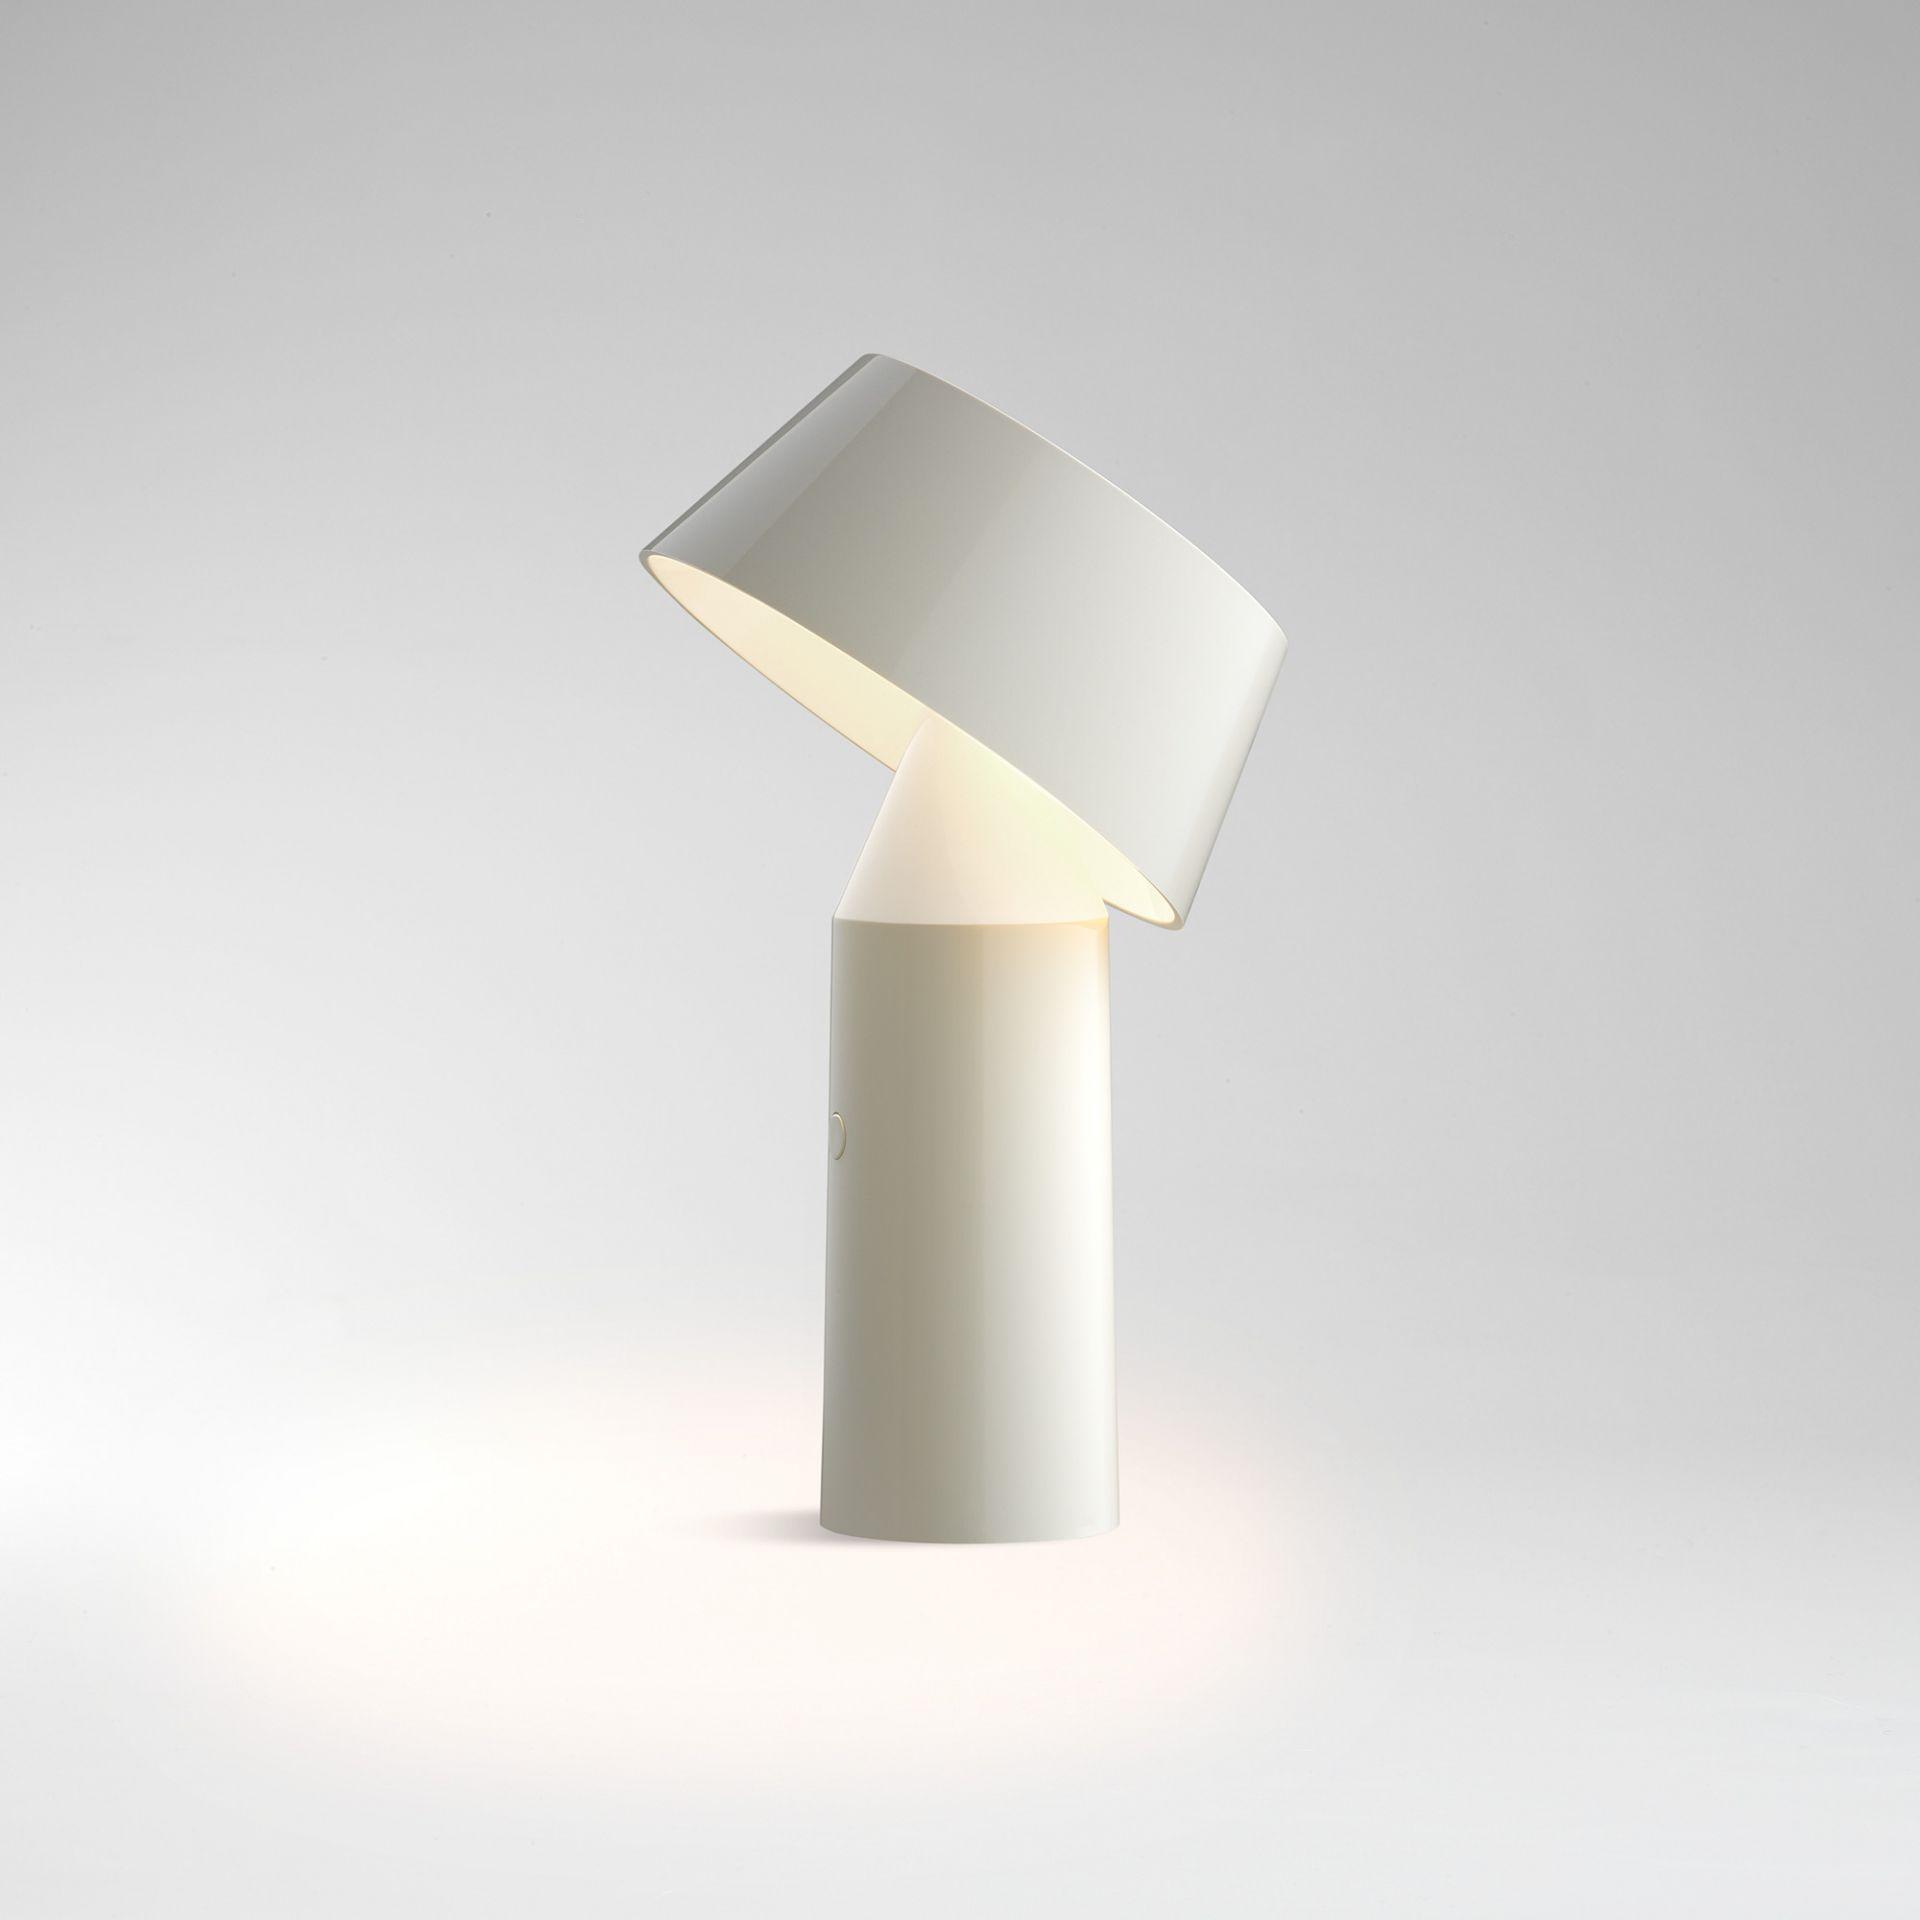 Bicoca Portable lamp Akkuleuchte / Tischleuchte Marset